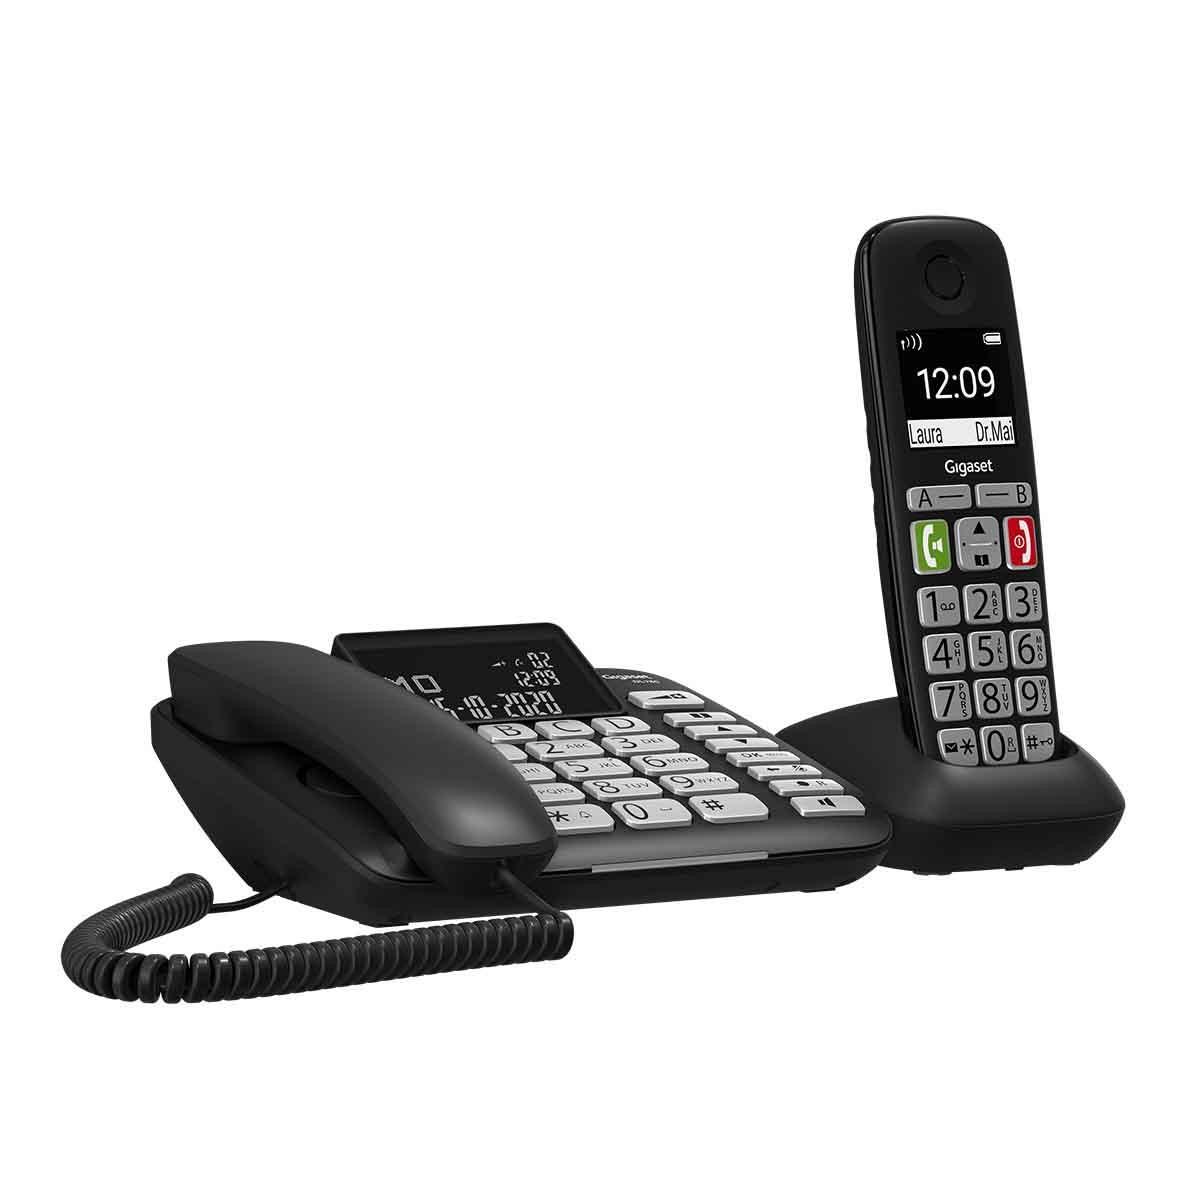 Gigaset DL780 Plus Σταθερό Ψηφιακό Τηλέφωνο + Ασύρματο Ψηφιακό Τηλέφωνο Μαύρο  με Υποδοχή Hands-Free